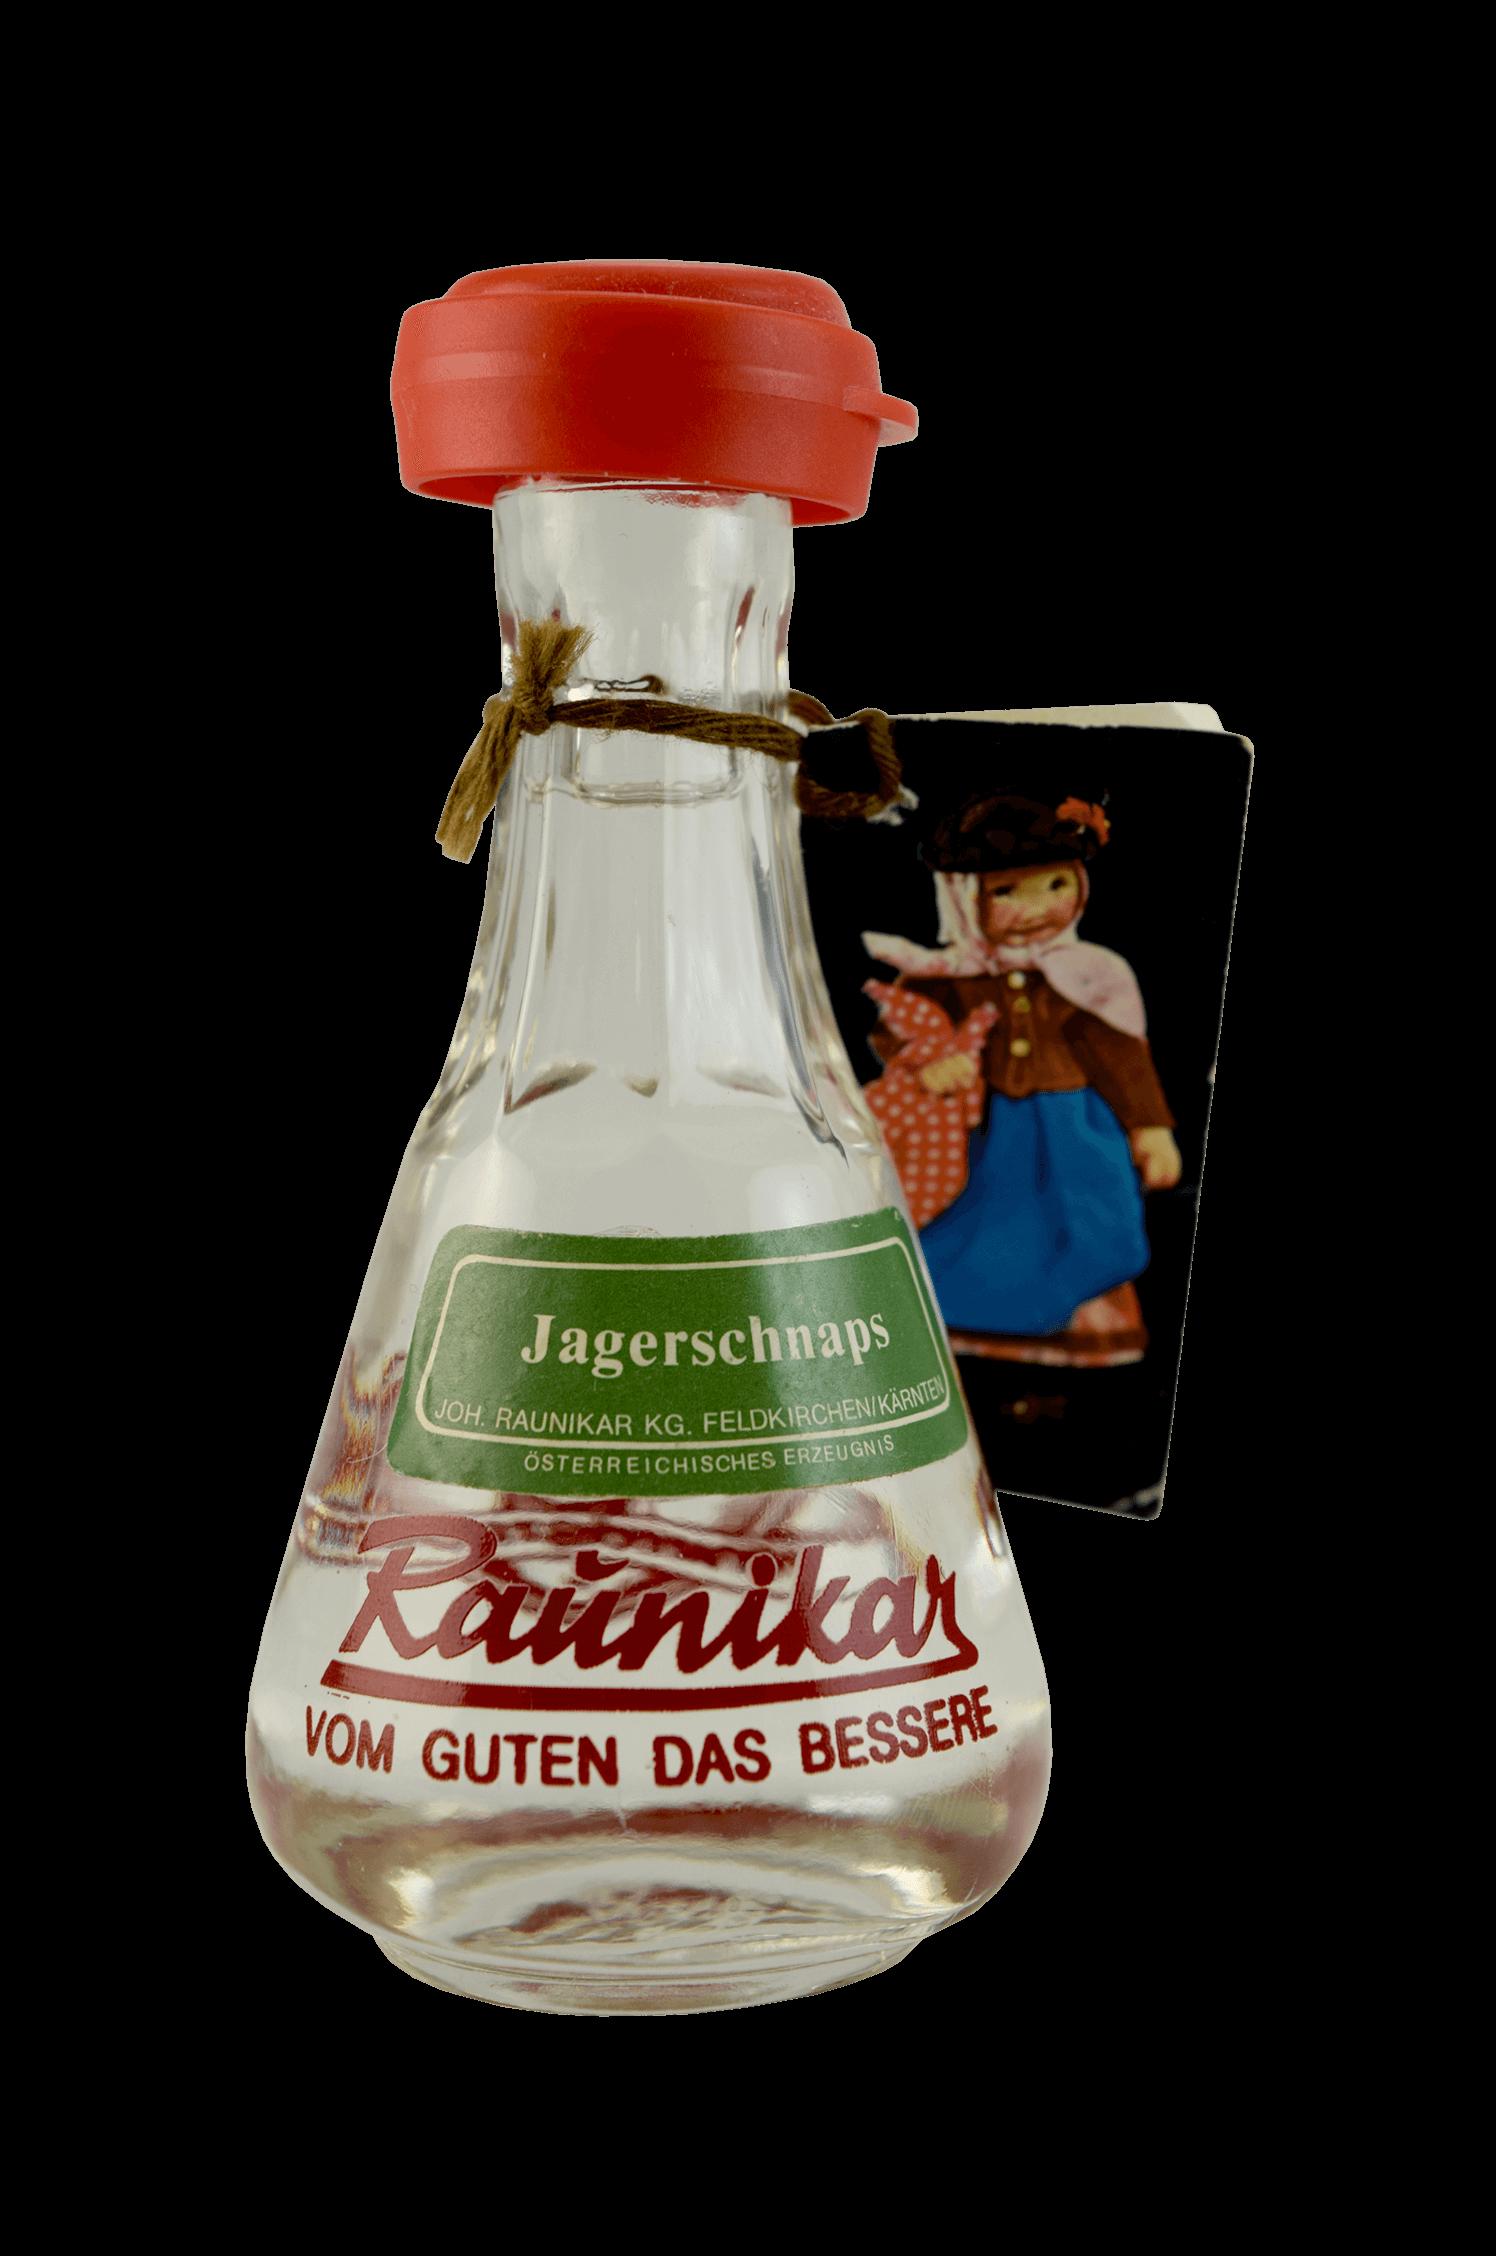 Jagerschnaps Raūnikar